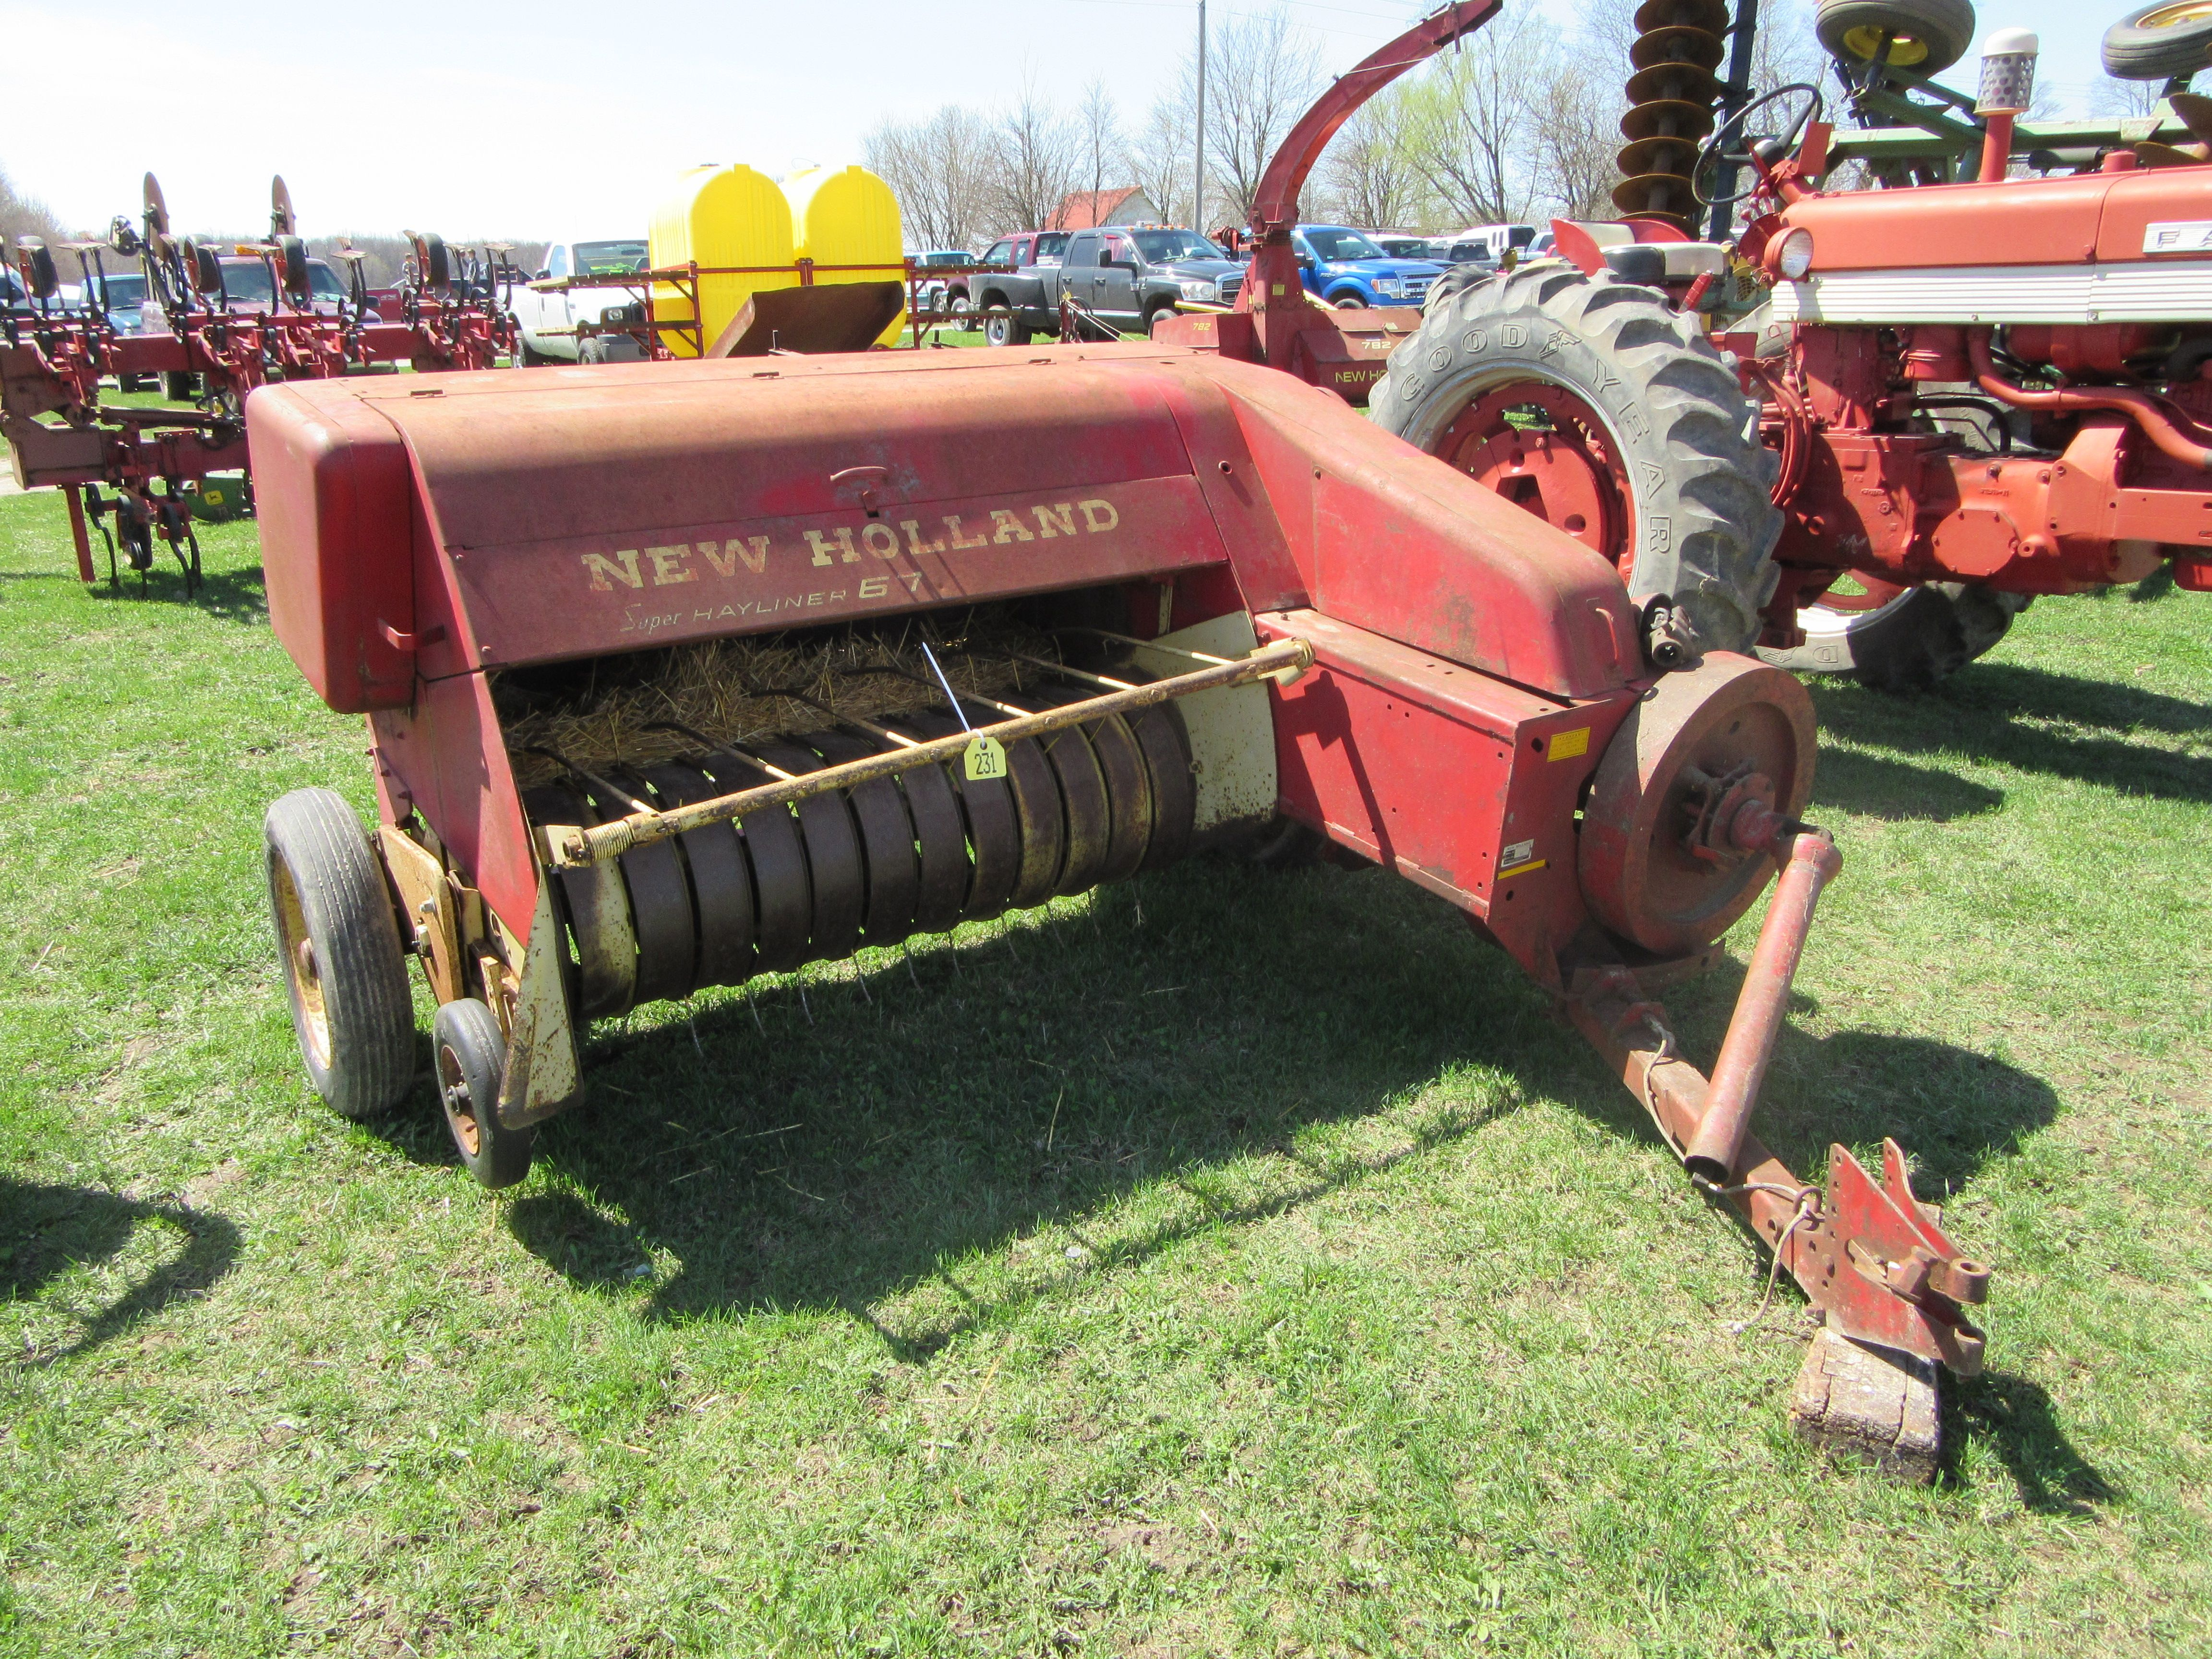 New Holland 67 Super Hayliner hay baler